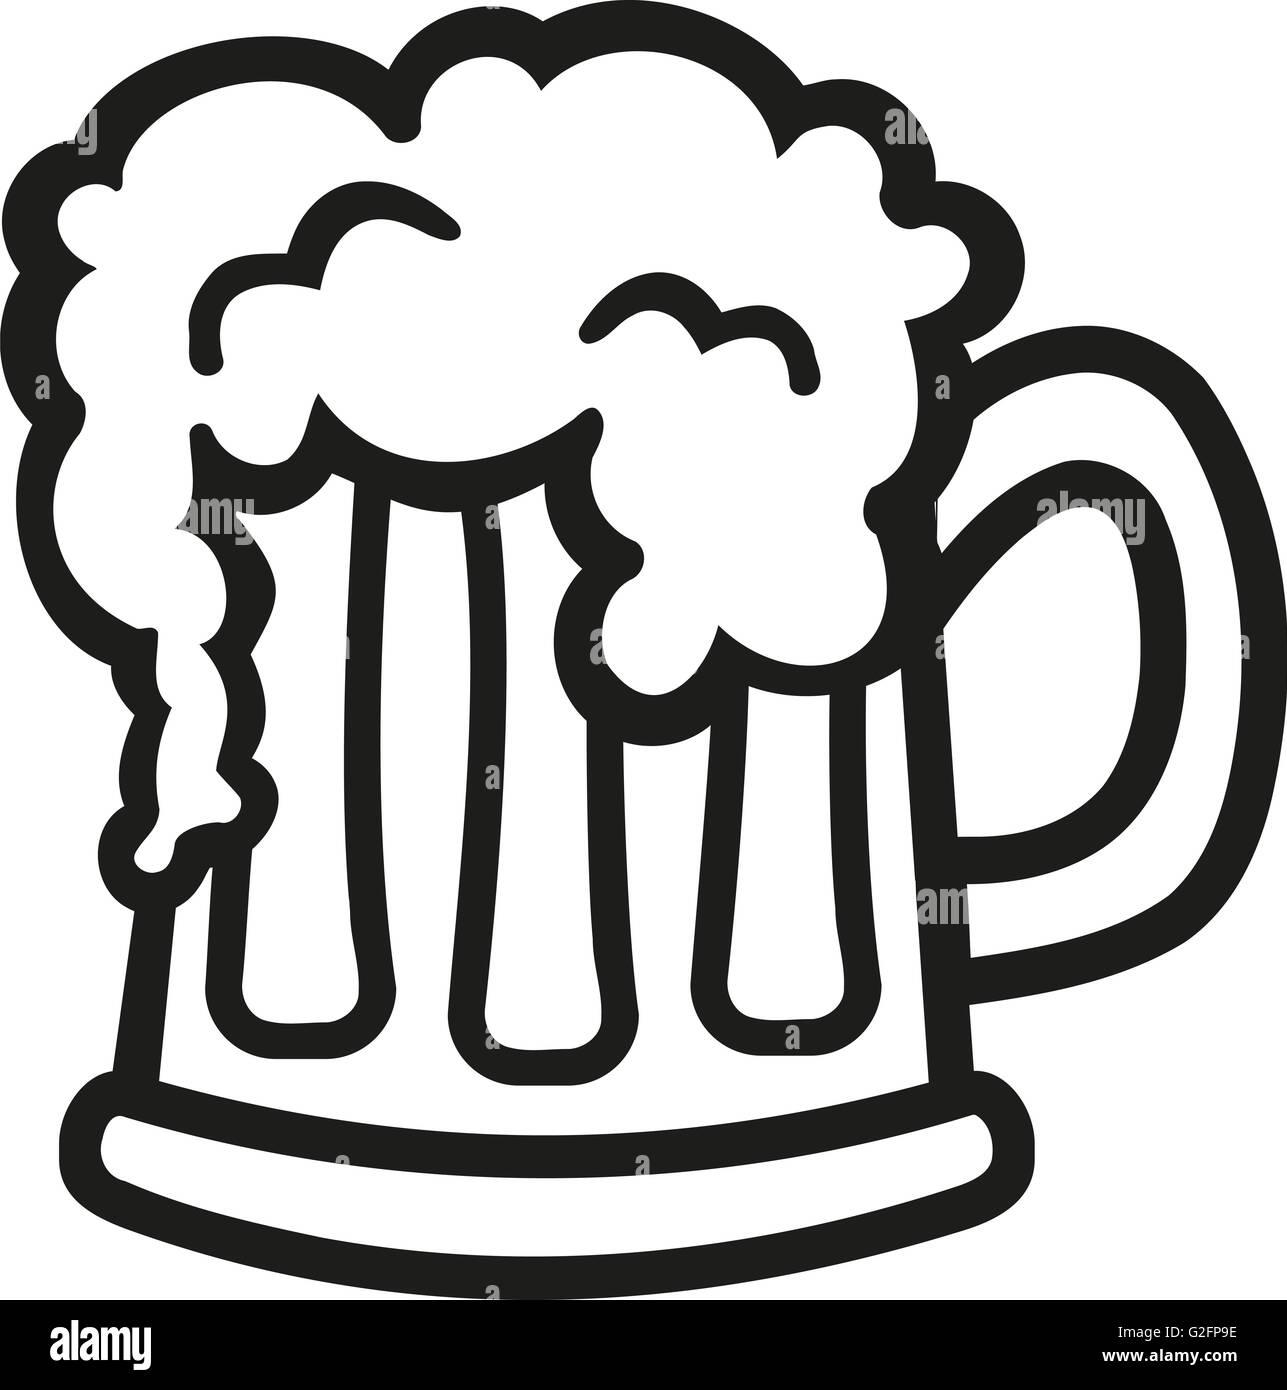 Cartoon Beer Mug High Resolution Stock Photography And Images Alamy